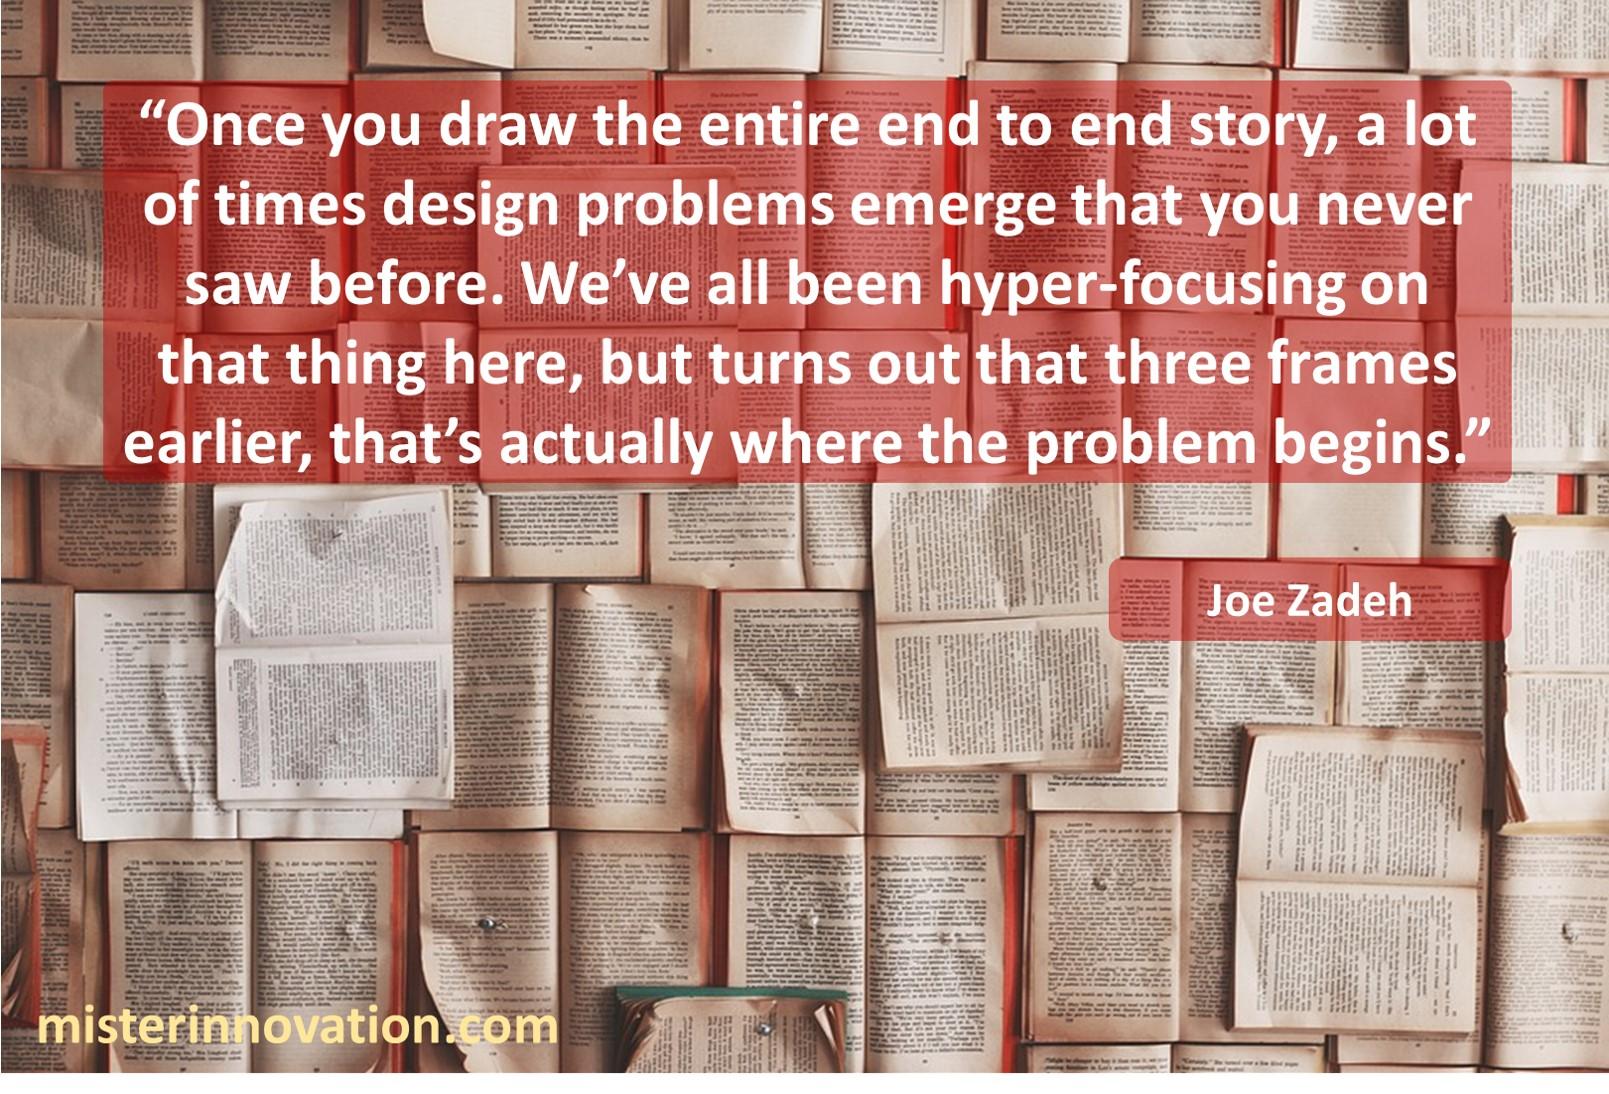 Joe Zadeh Storytelling Helps Design Problems Emerge